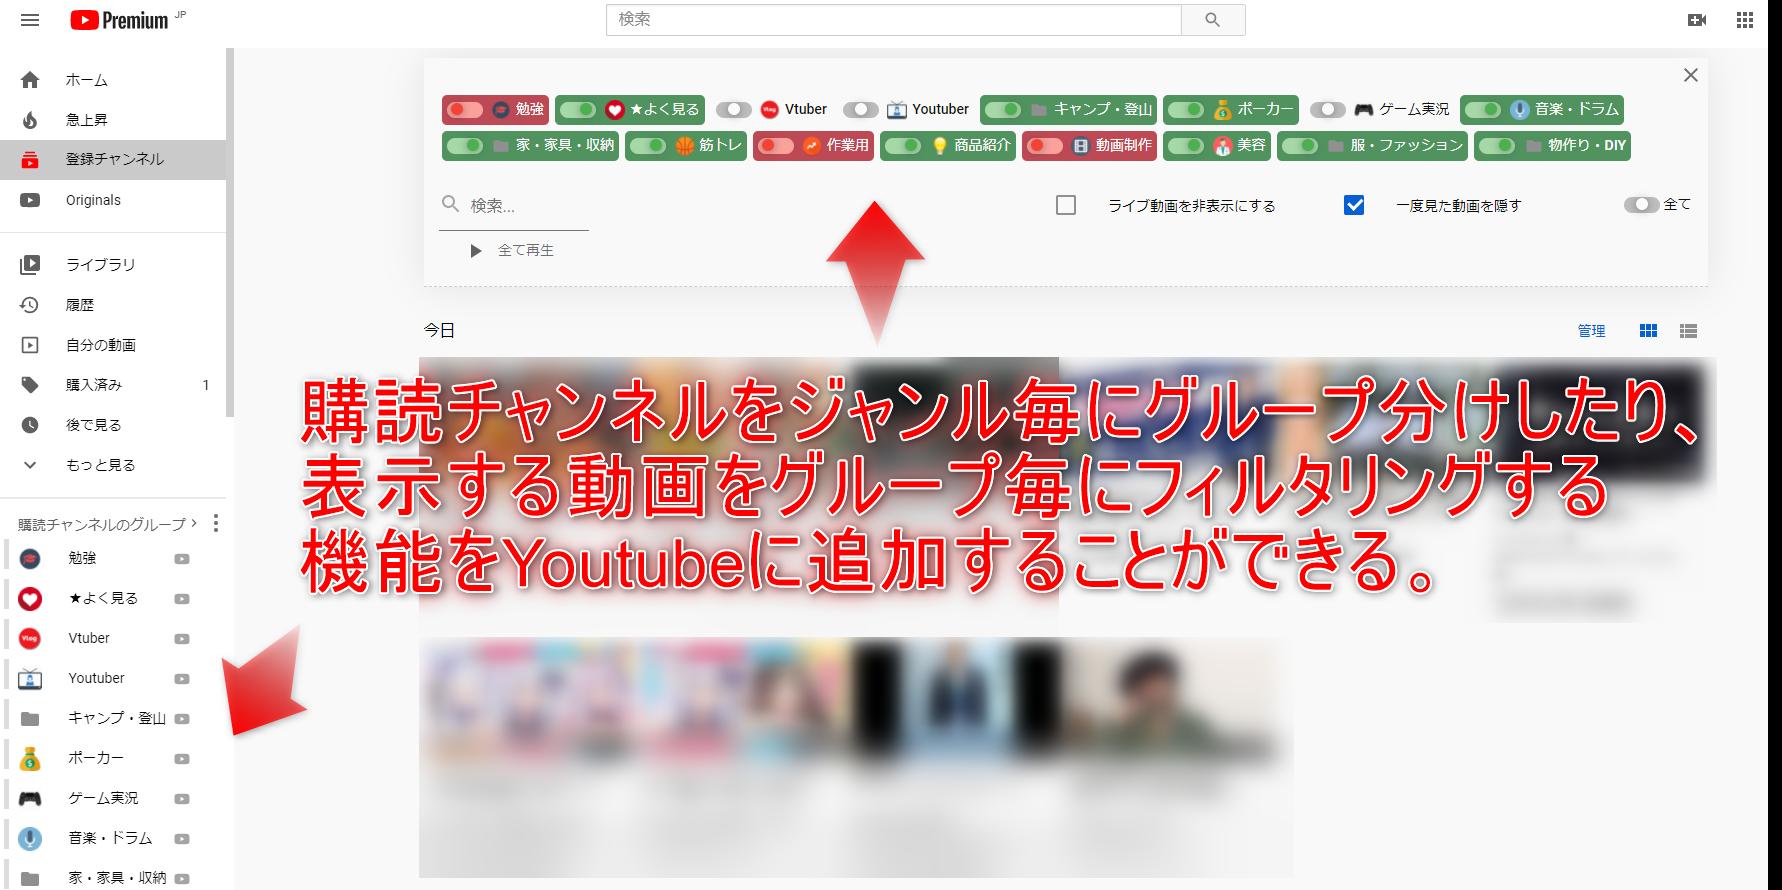 ▲PocketTubeで出来ることの概要説明(クリックで拡大)